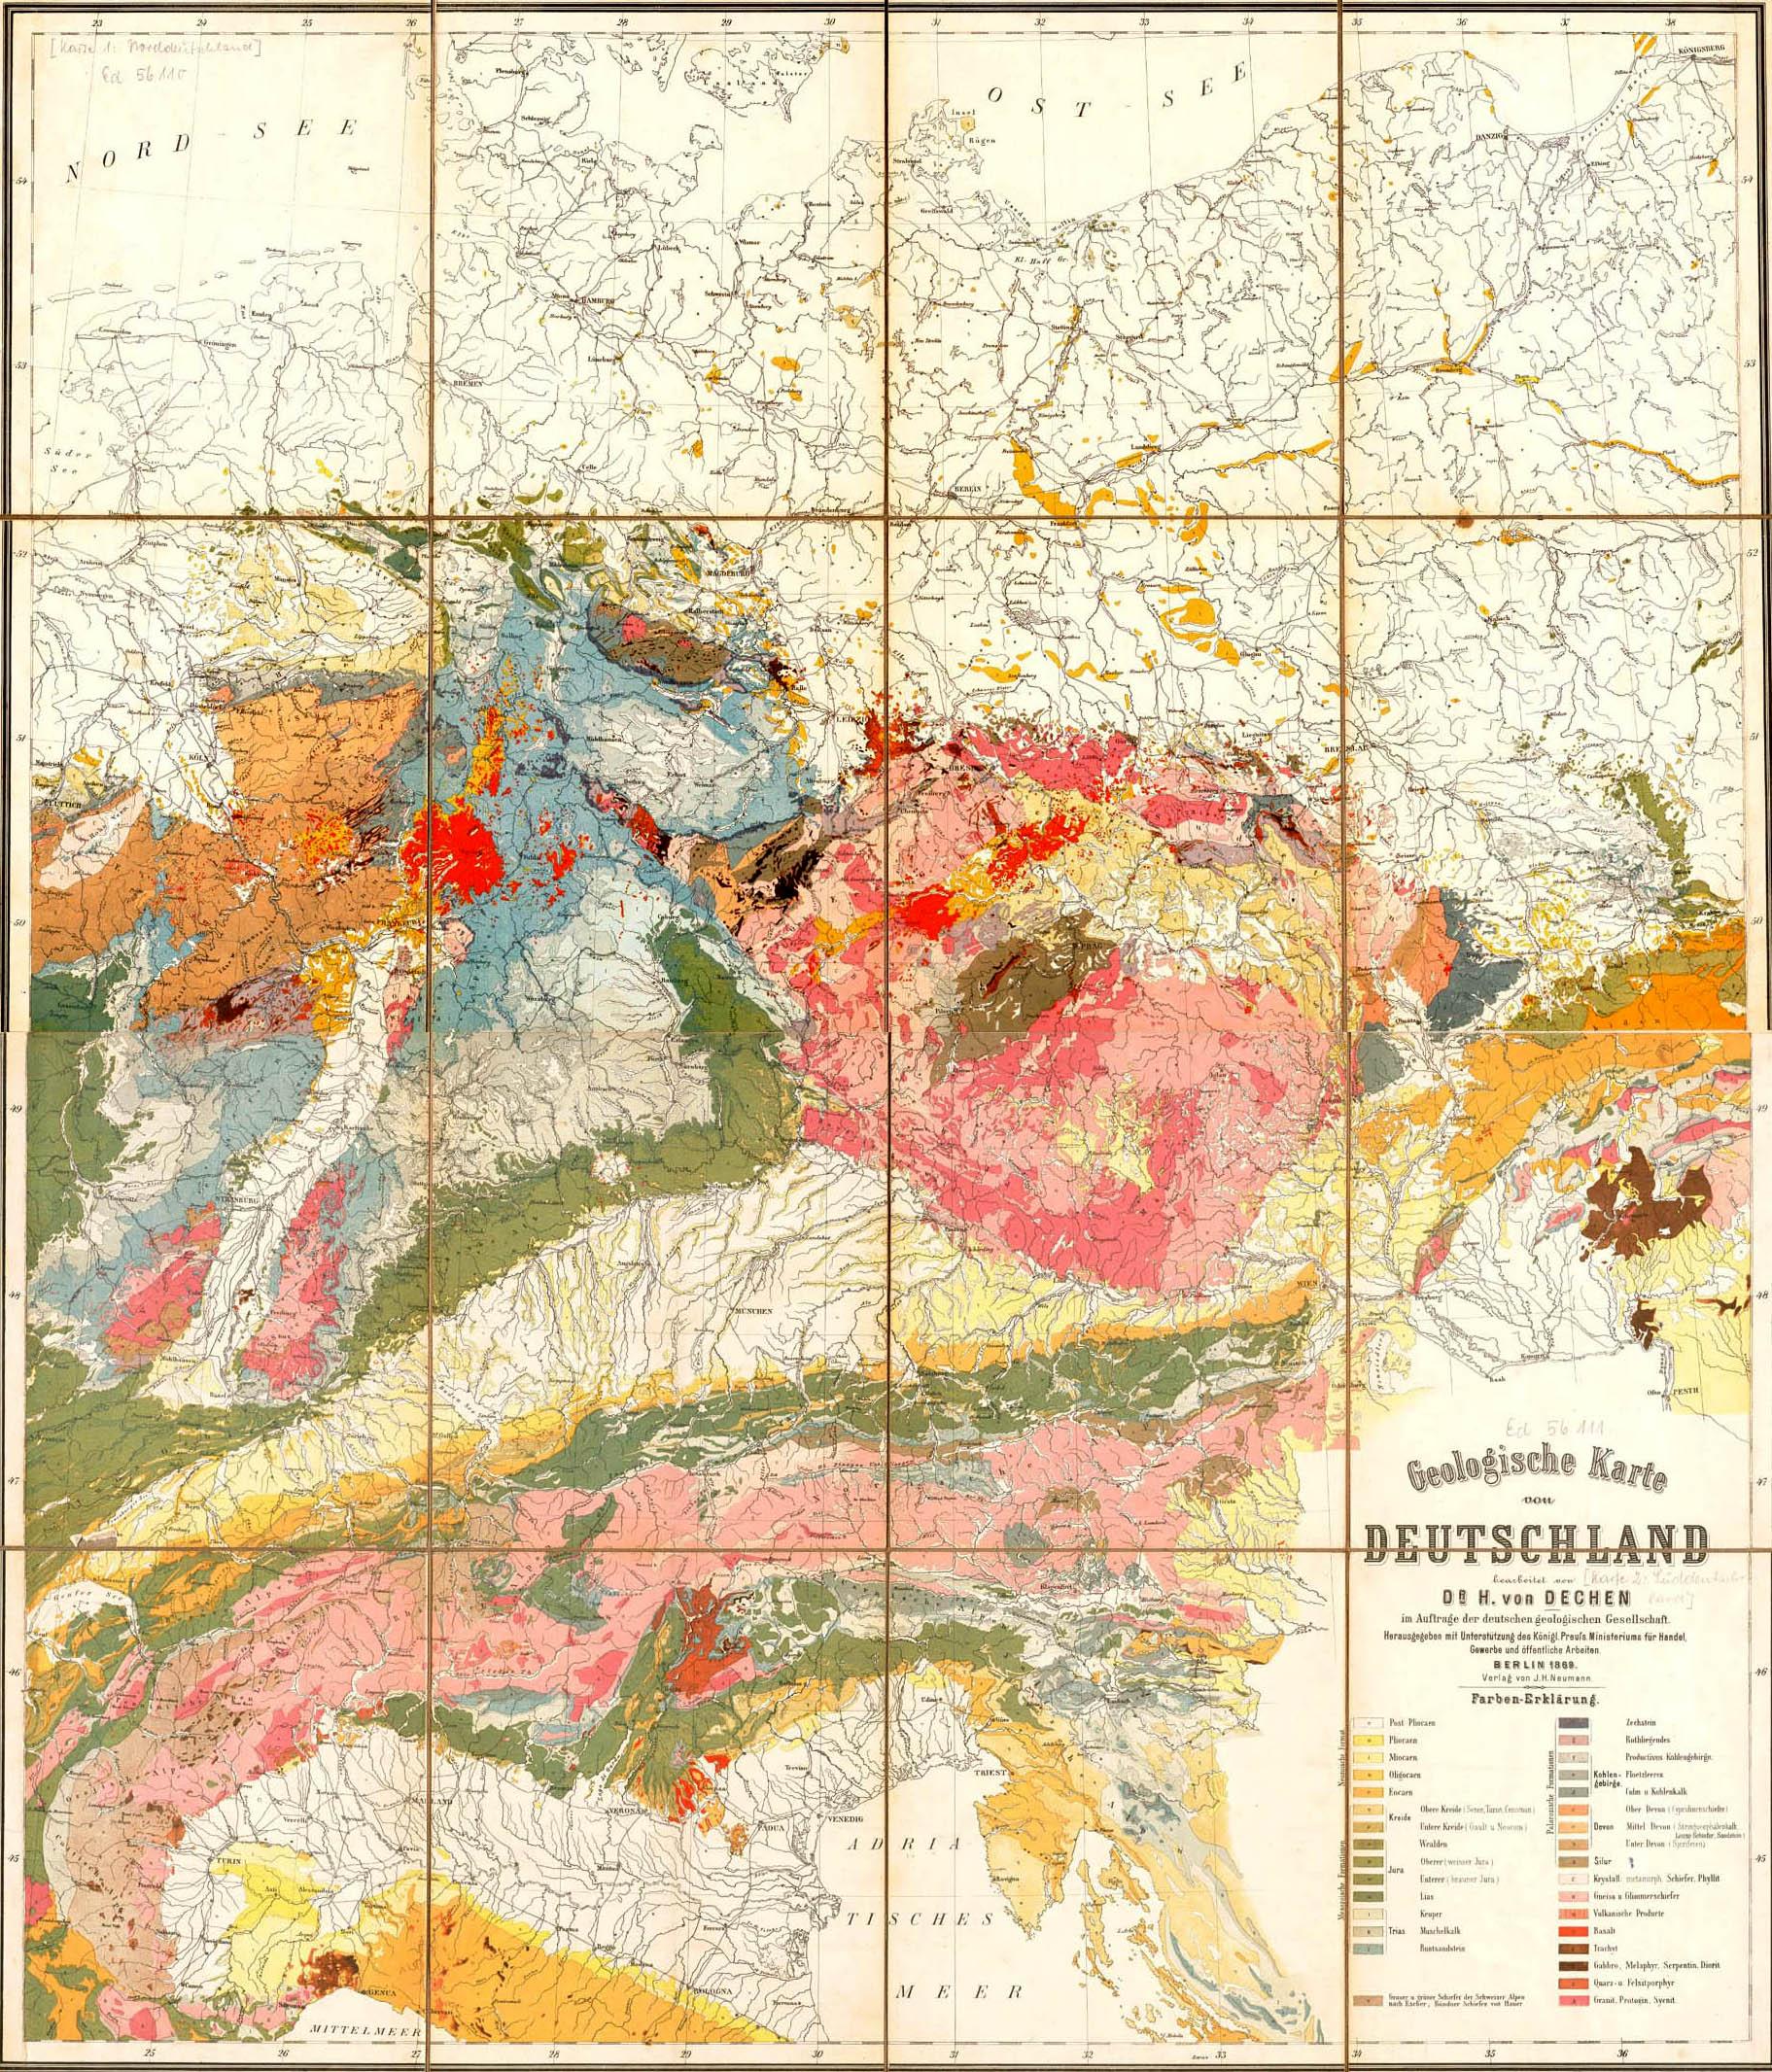 Mapa geológico de Alemania 1869